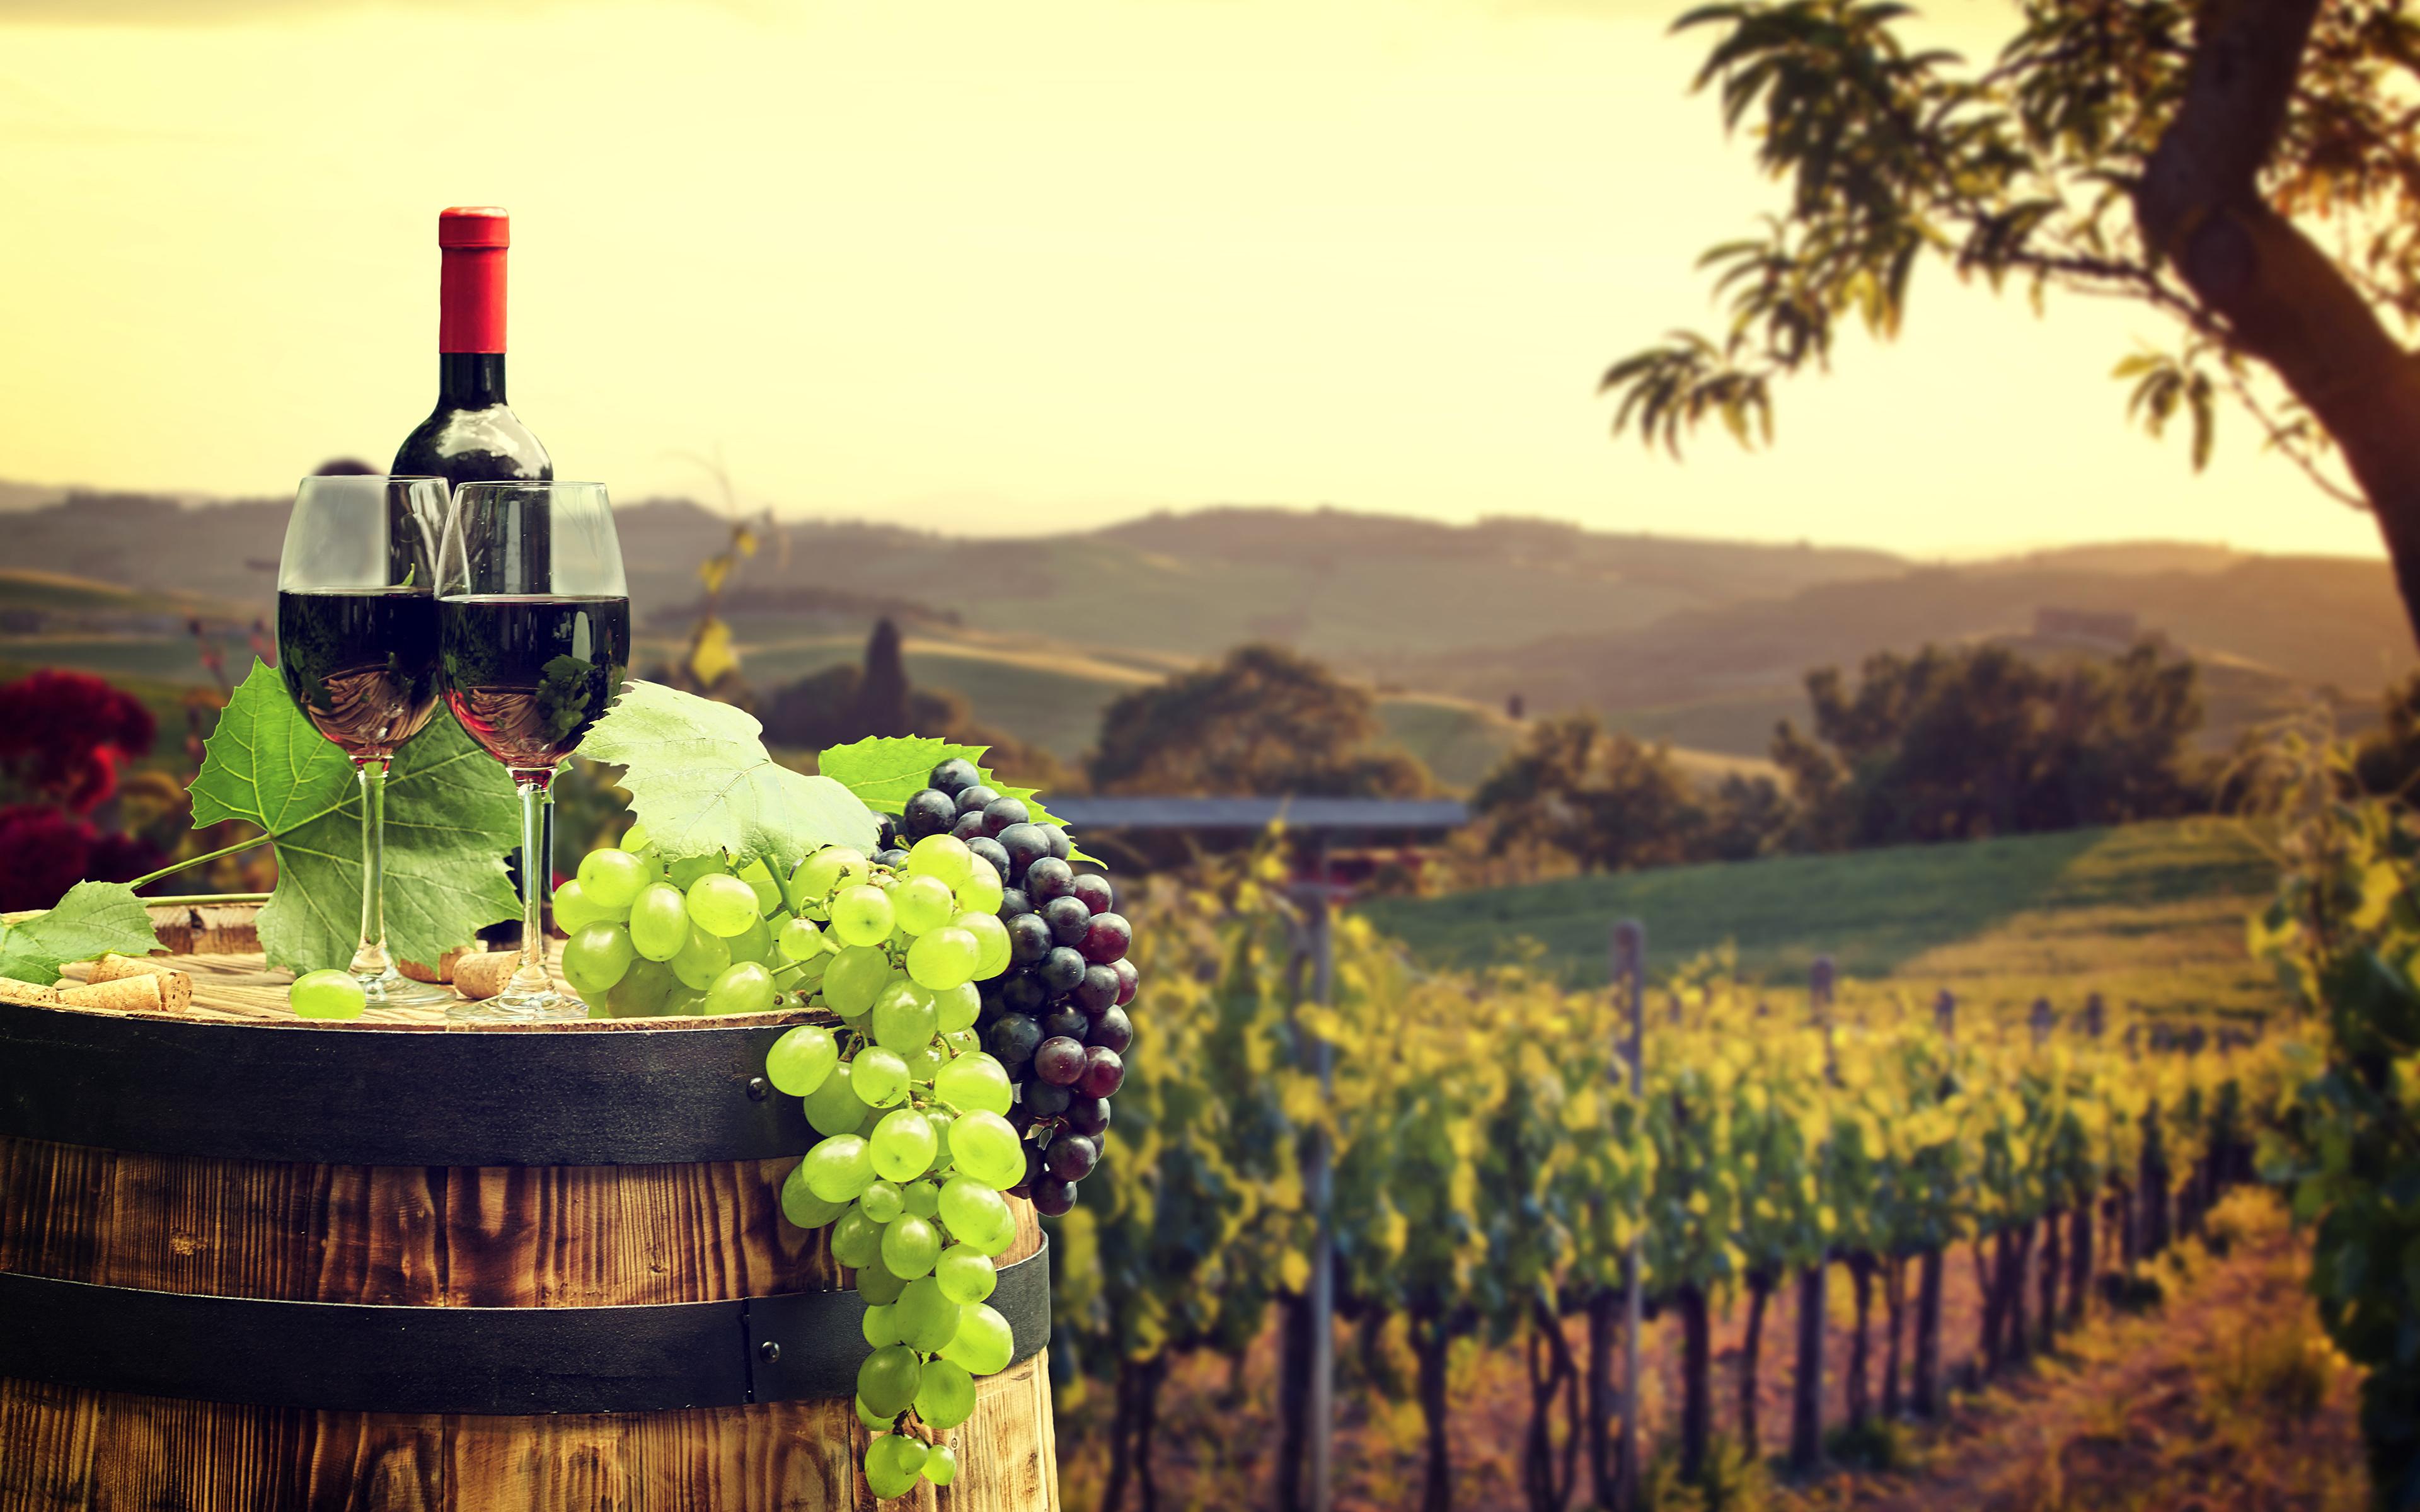 nyito-wine_grapes_barrel_497687_3840x2400.jpg